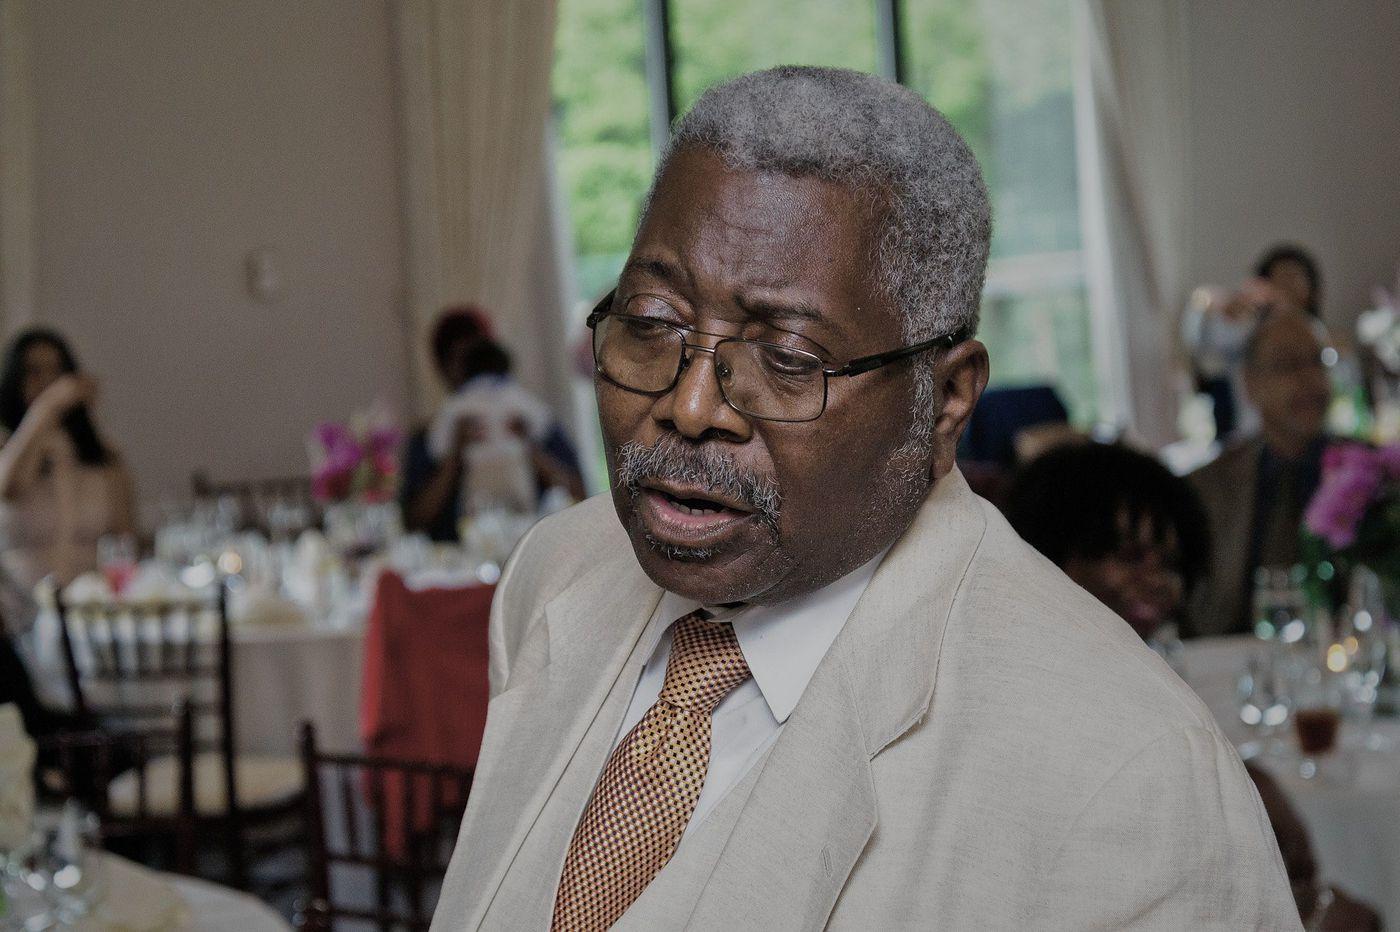 James E. Randolph Jr., former deputy commissioner of juvenile justice, dies at 72